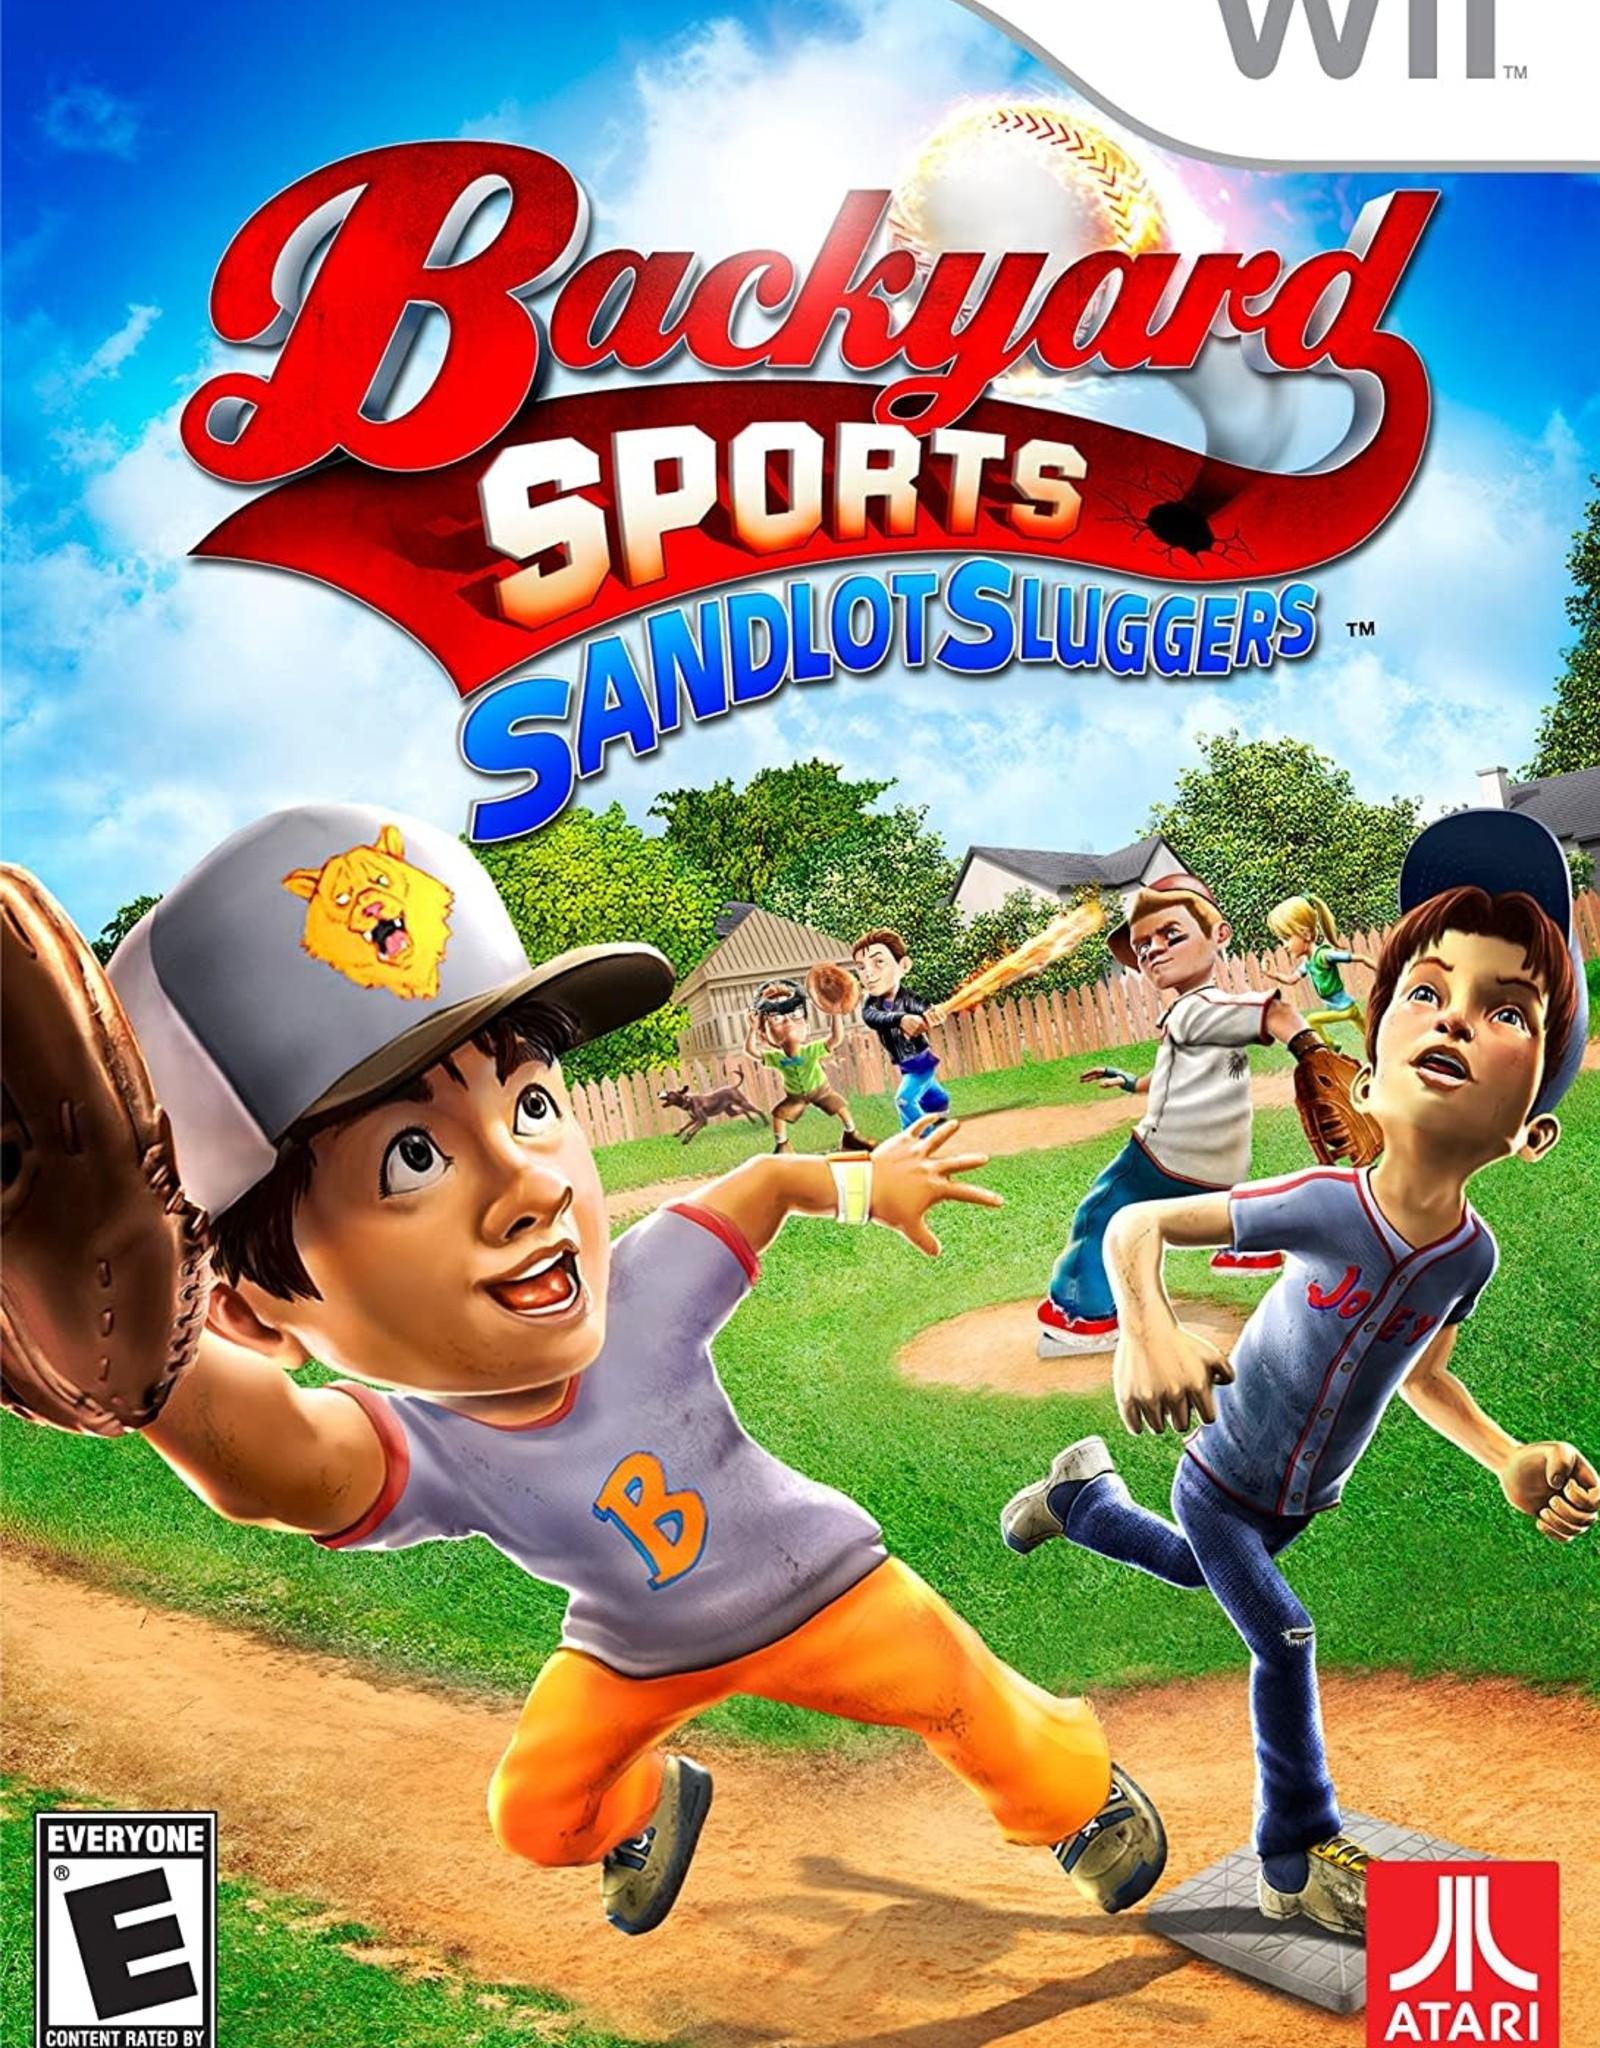 Wii Backyard Sports: Sandlot Sluggers (CIB)